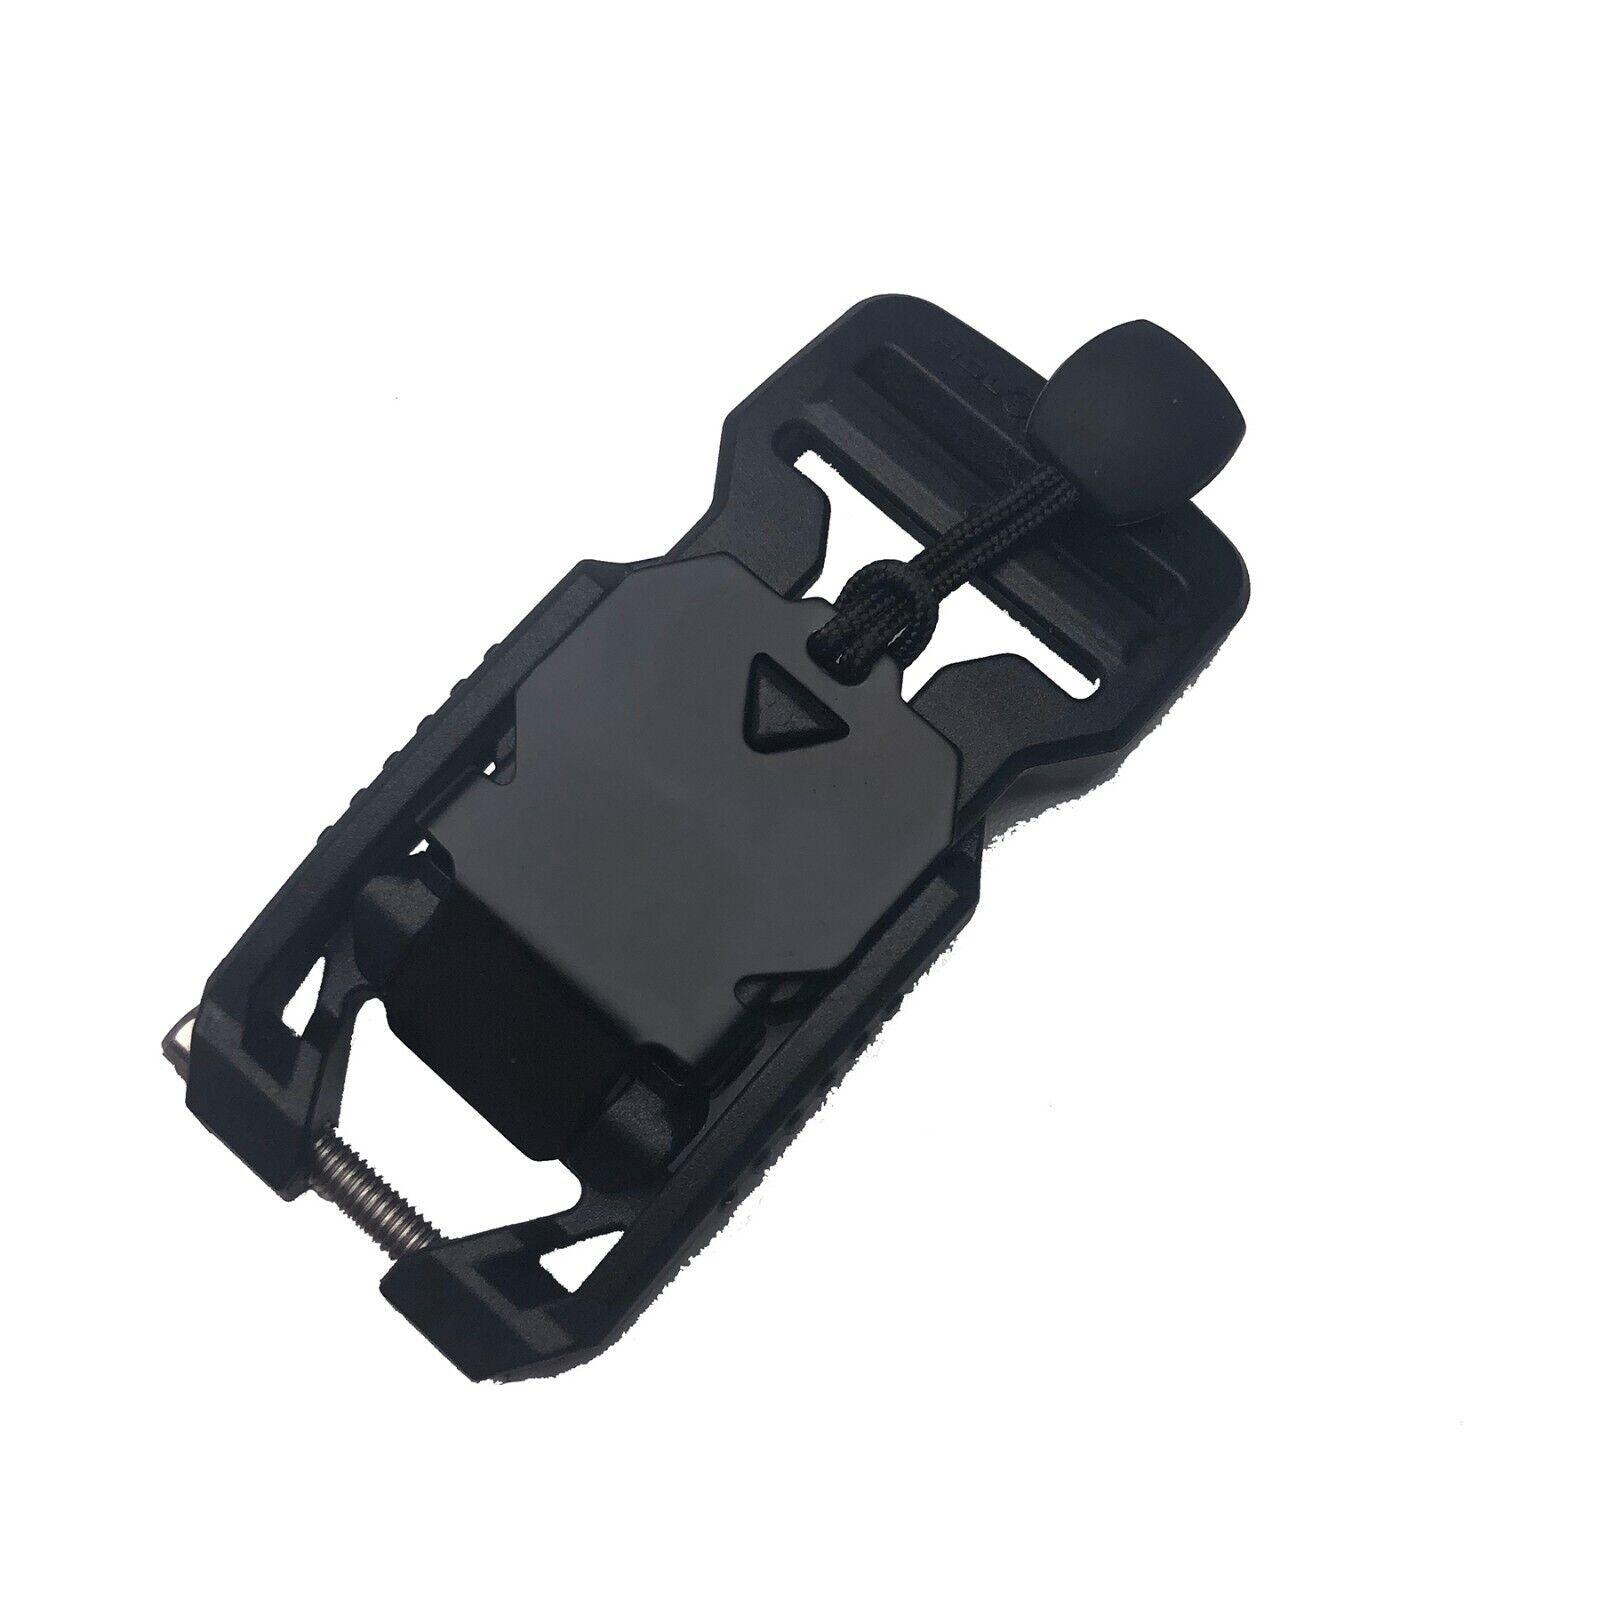 BLACK Fidlock Swivel Mount V-Buckle 25mm Pull - Magnetic Connector Fastener